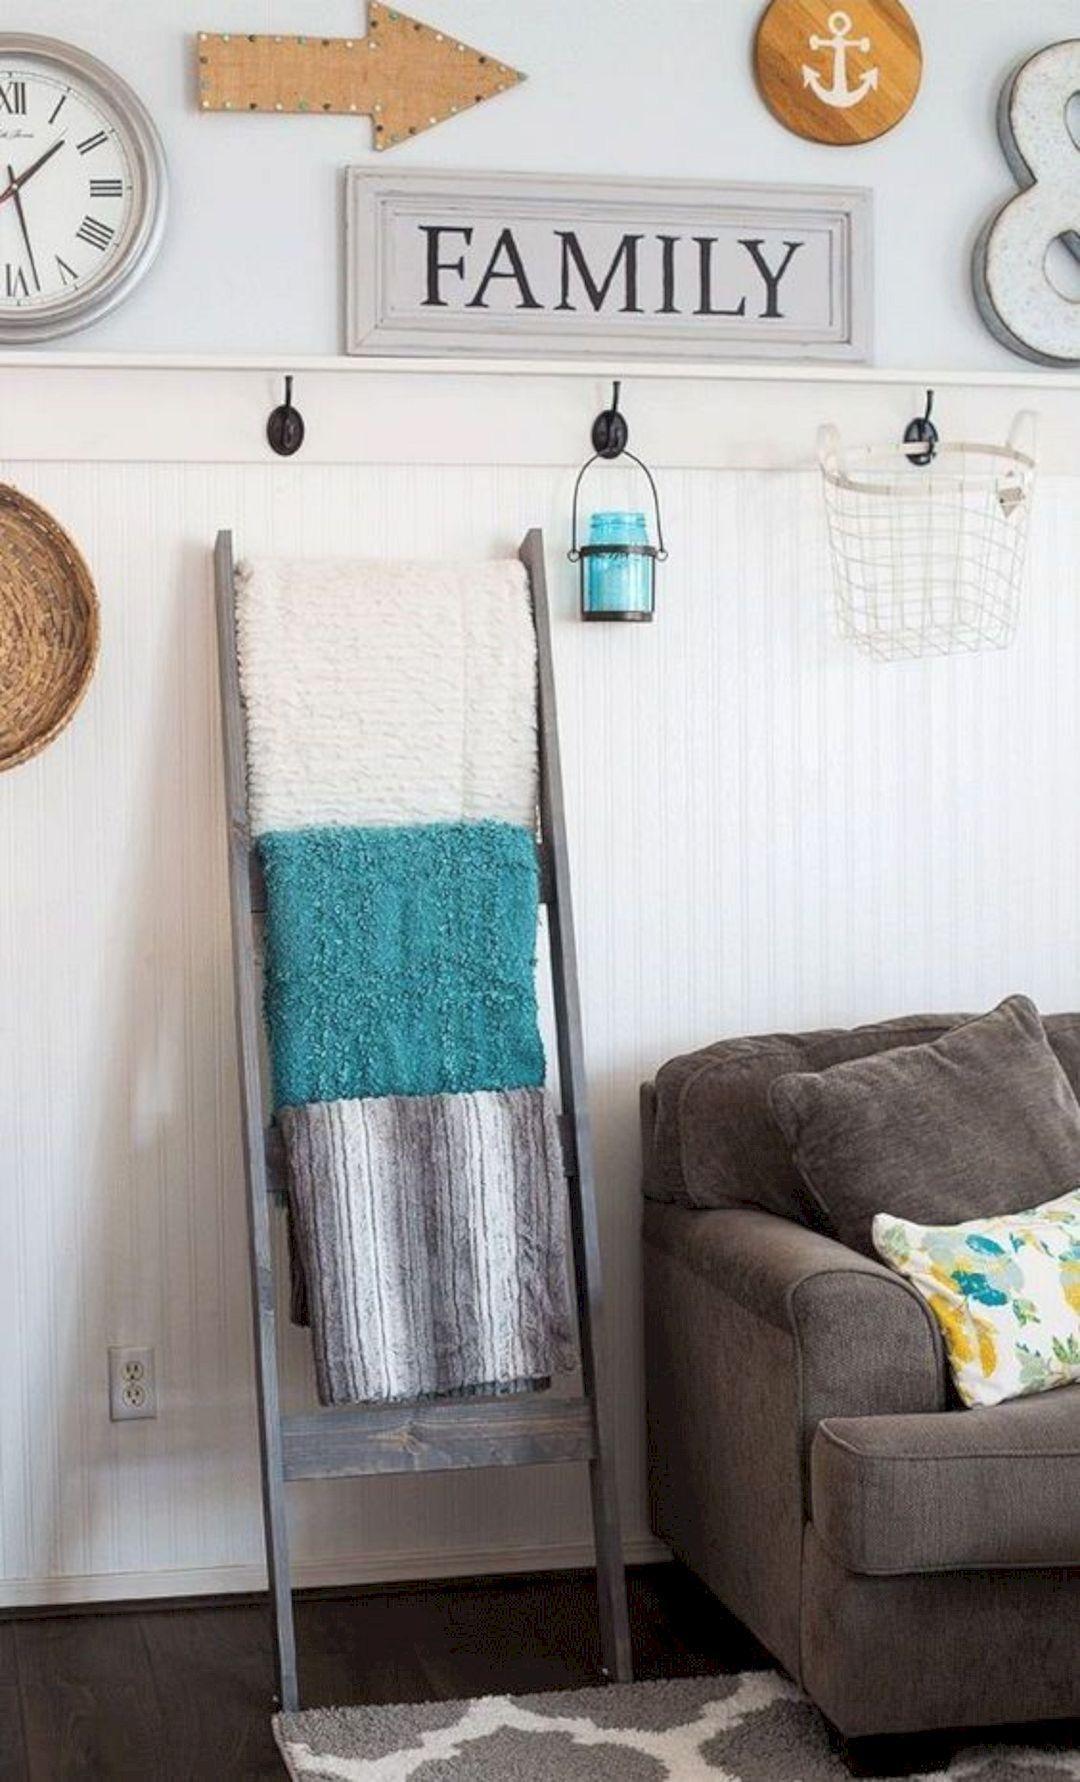 Diy Home Decorating Ideas 11 | home decor | Pinterest | DIY ideas ...